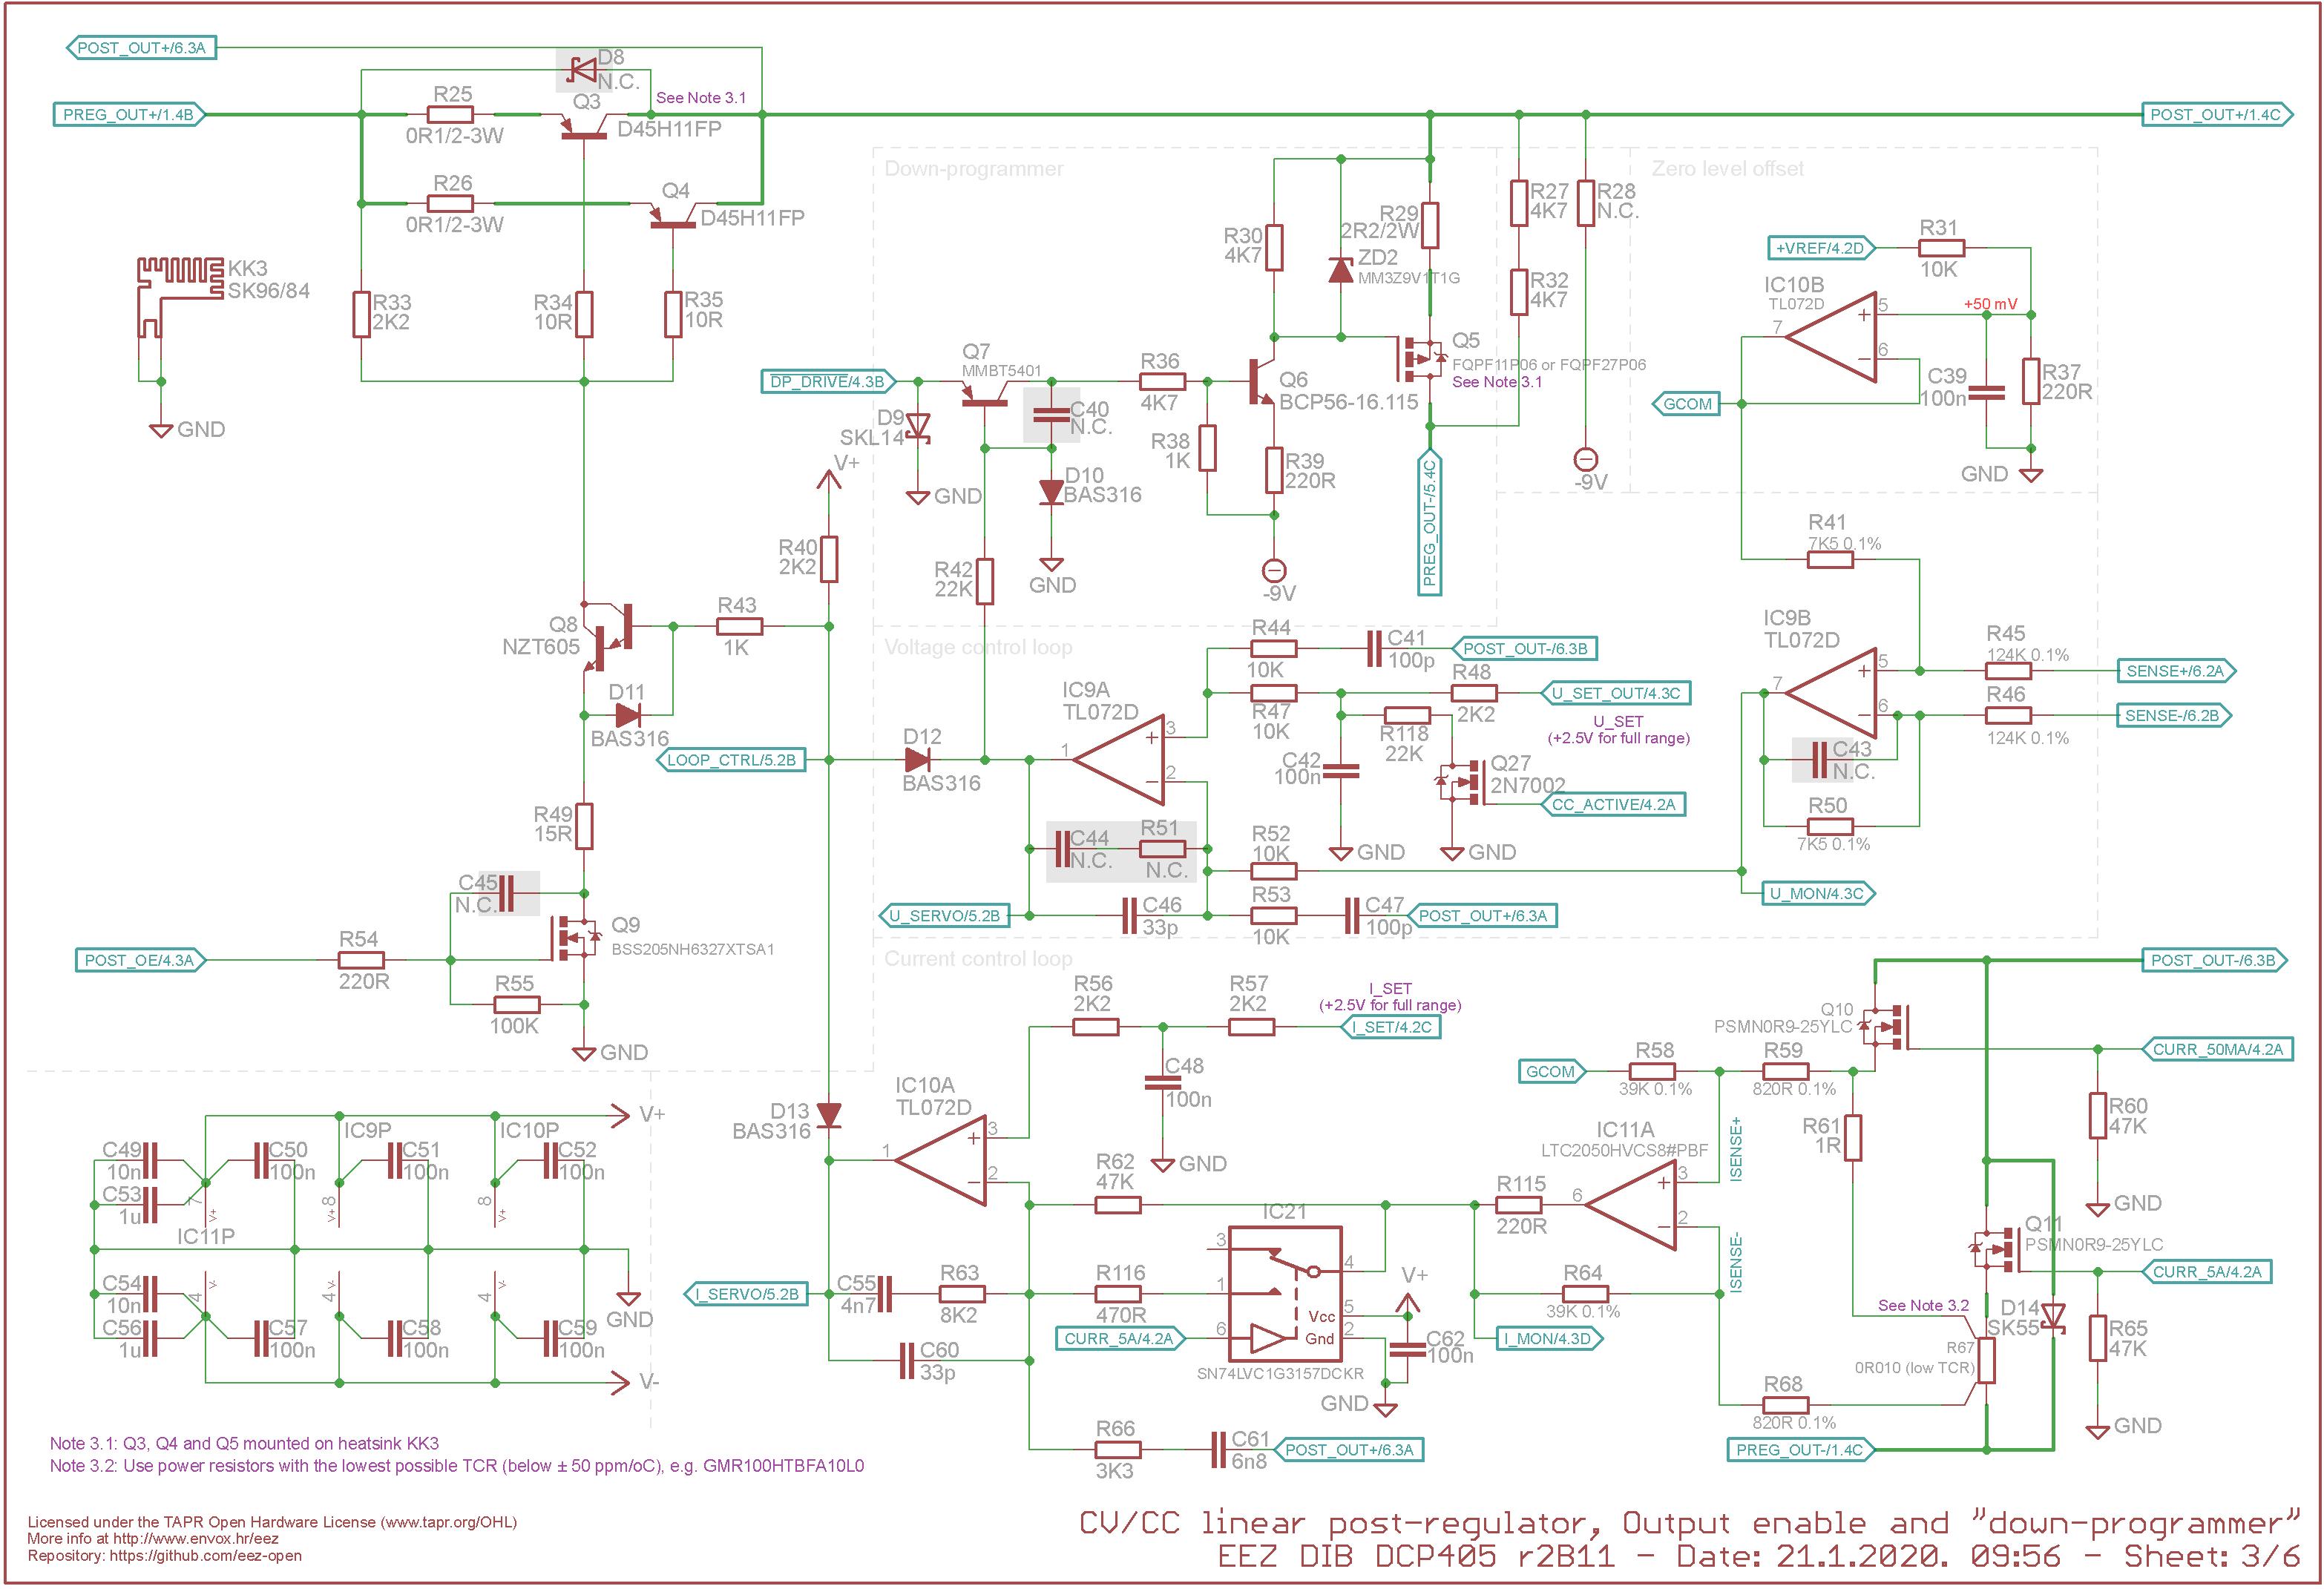 eez_dcp405_r2b11_sheet3of6.png